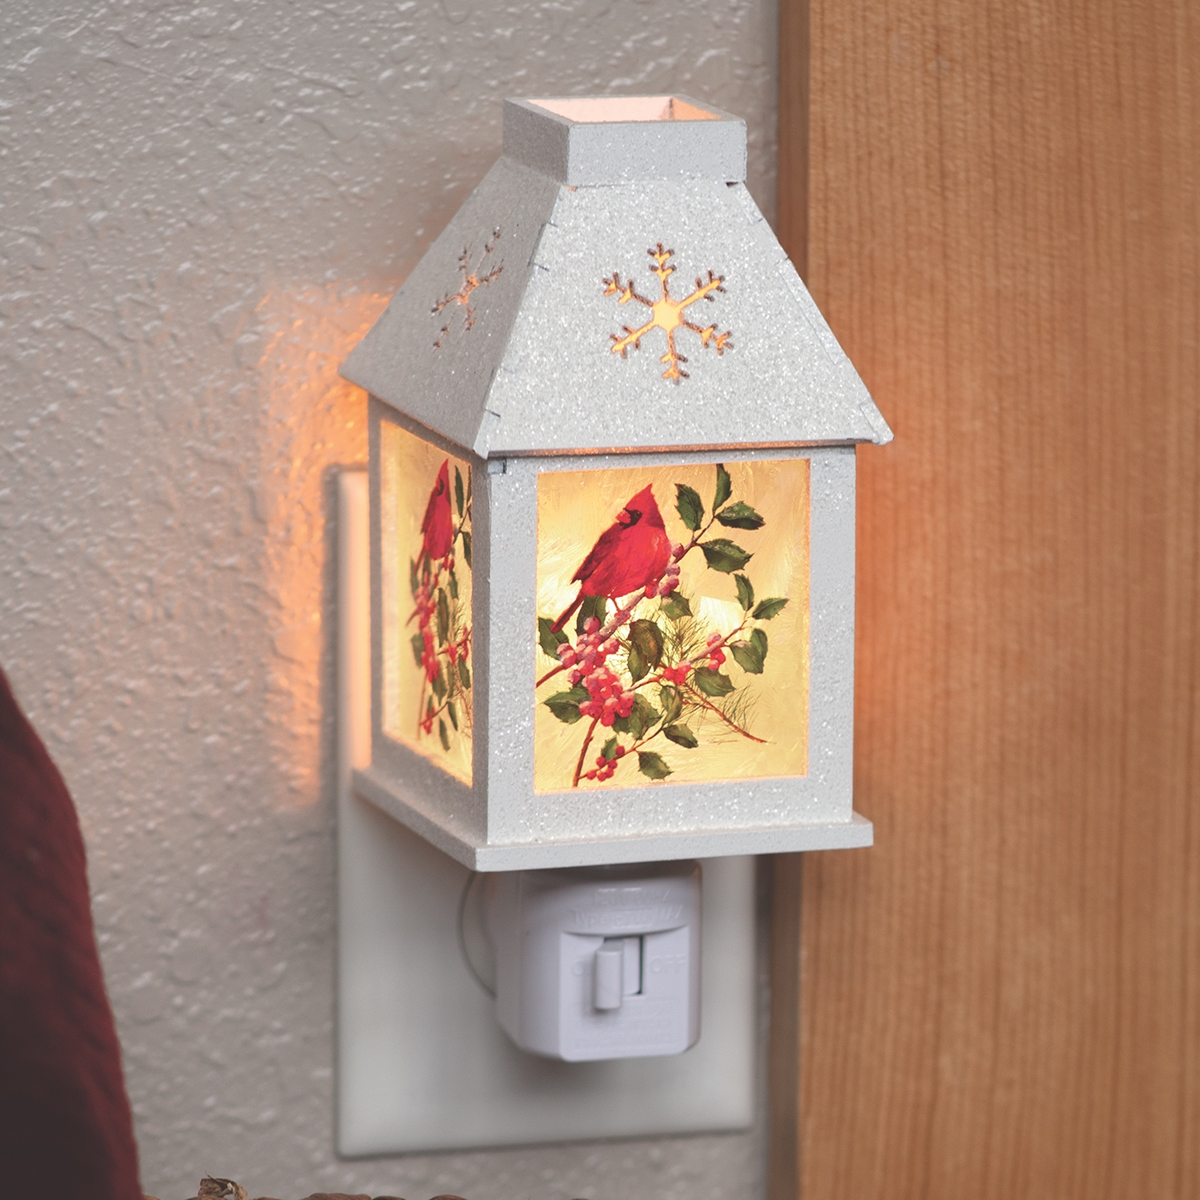 Cardinal Holly and Berry Nightlight